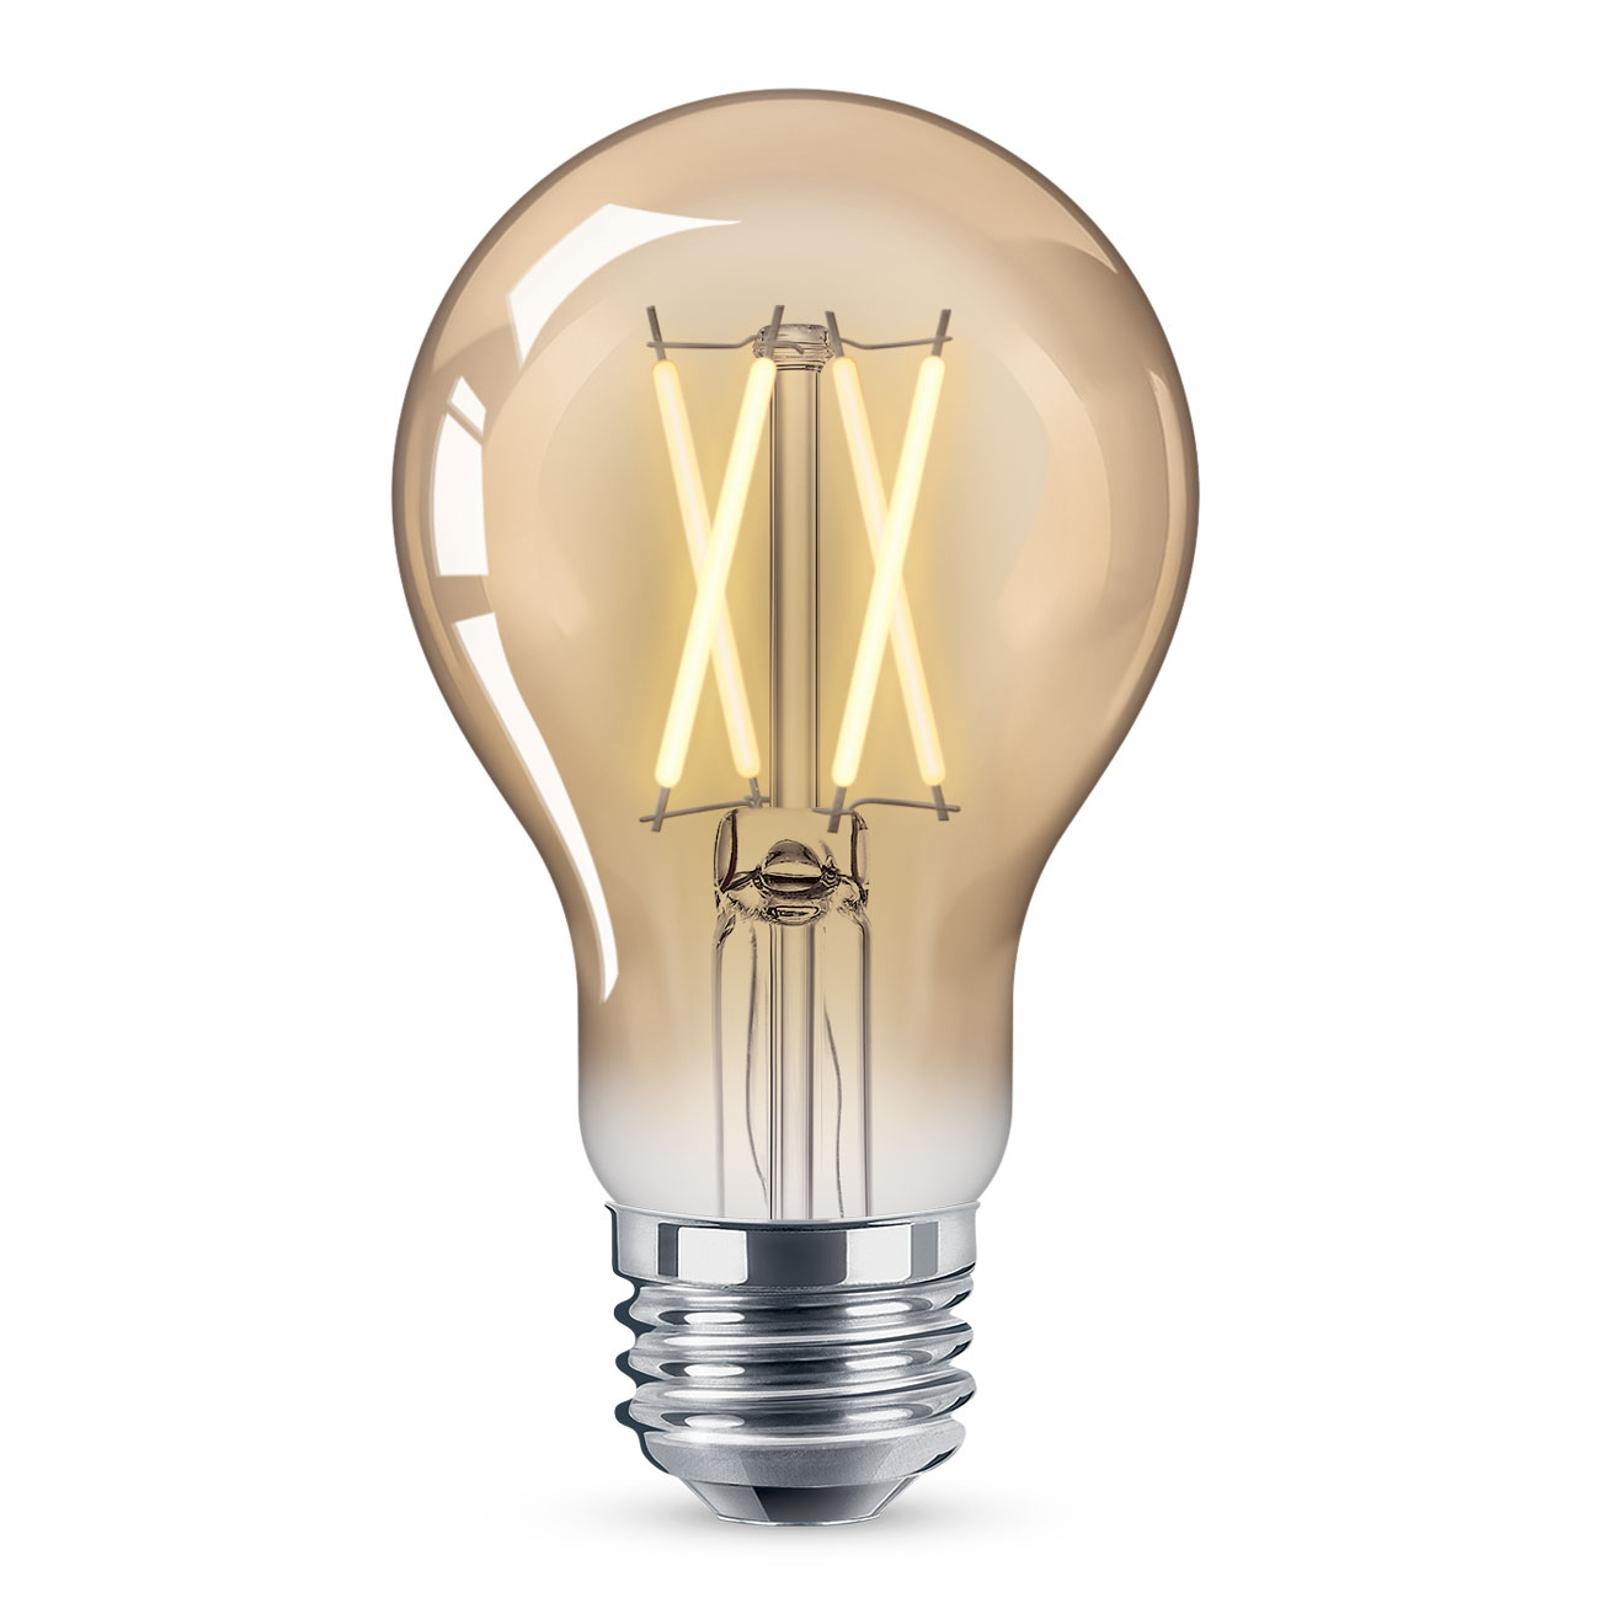 WiZ E27 LED A60 Filament amber 6,5W 2.000-4.500K